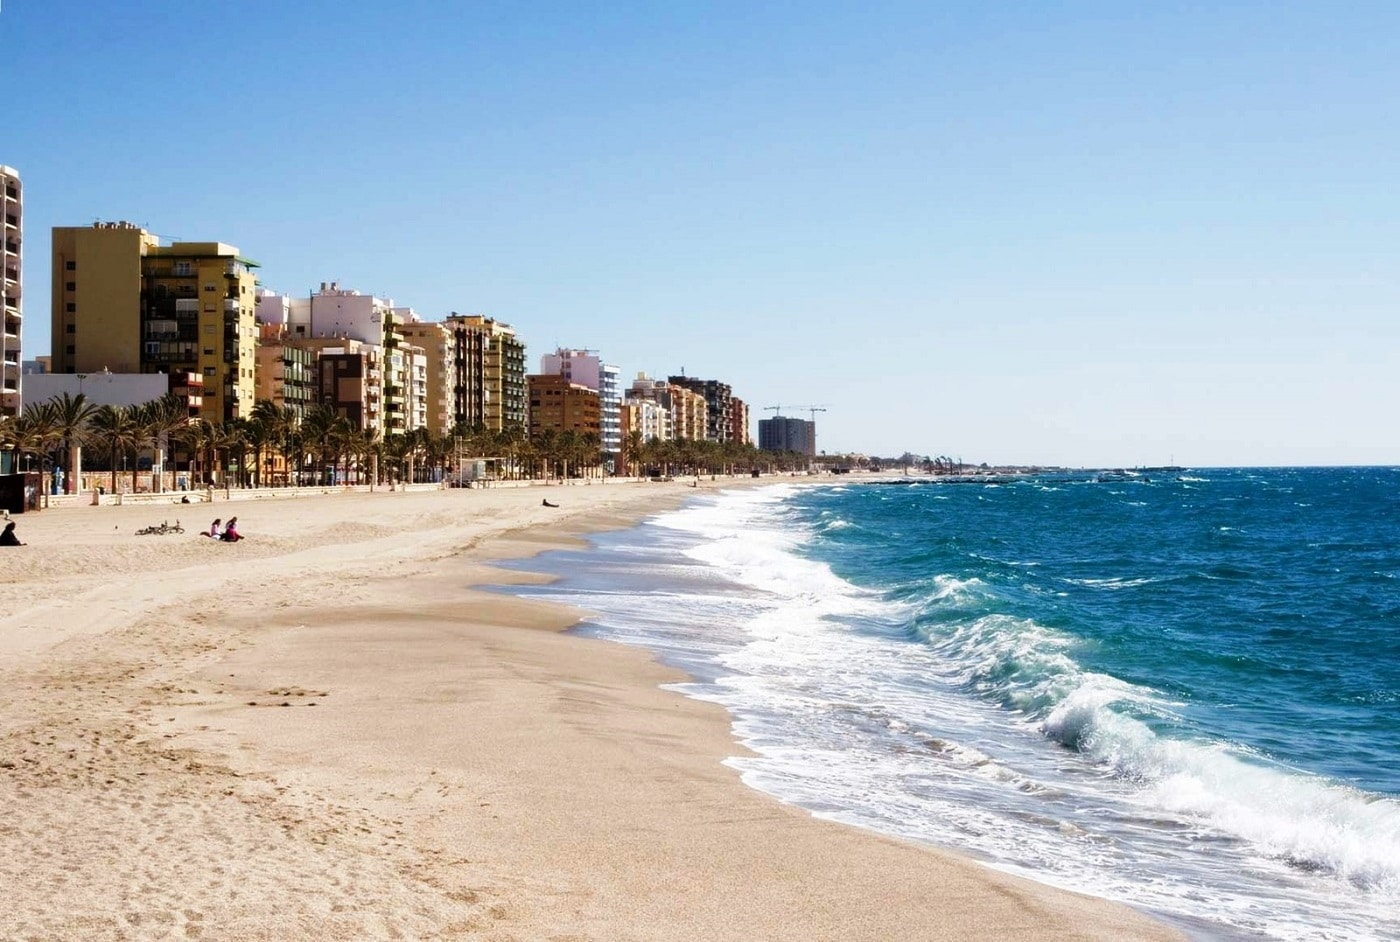 Plaja Las Salinas, Almeria